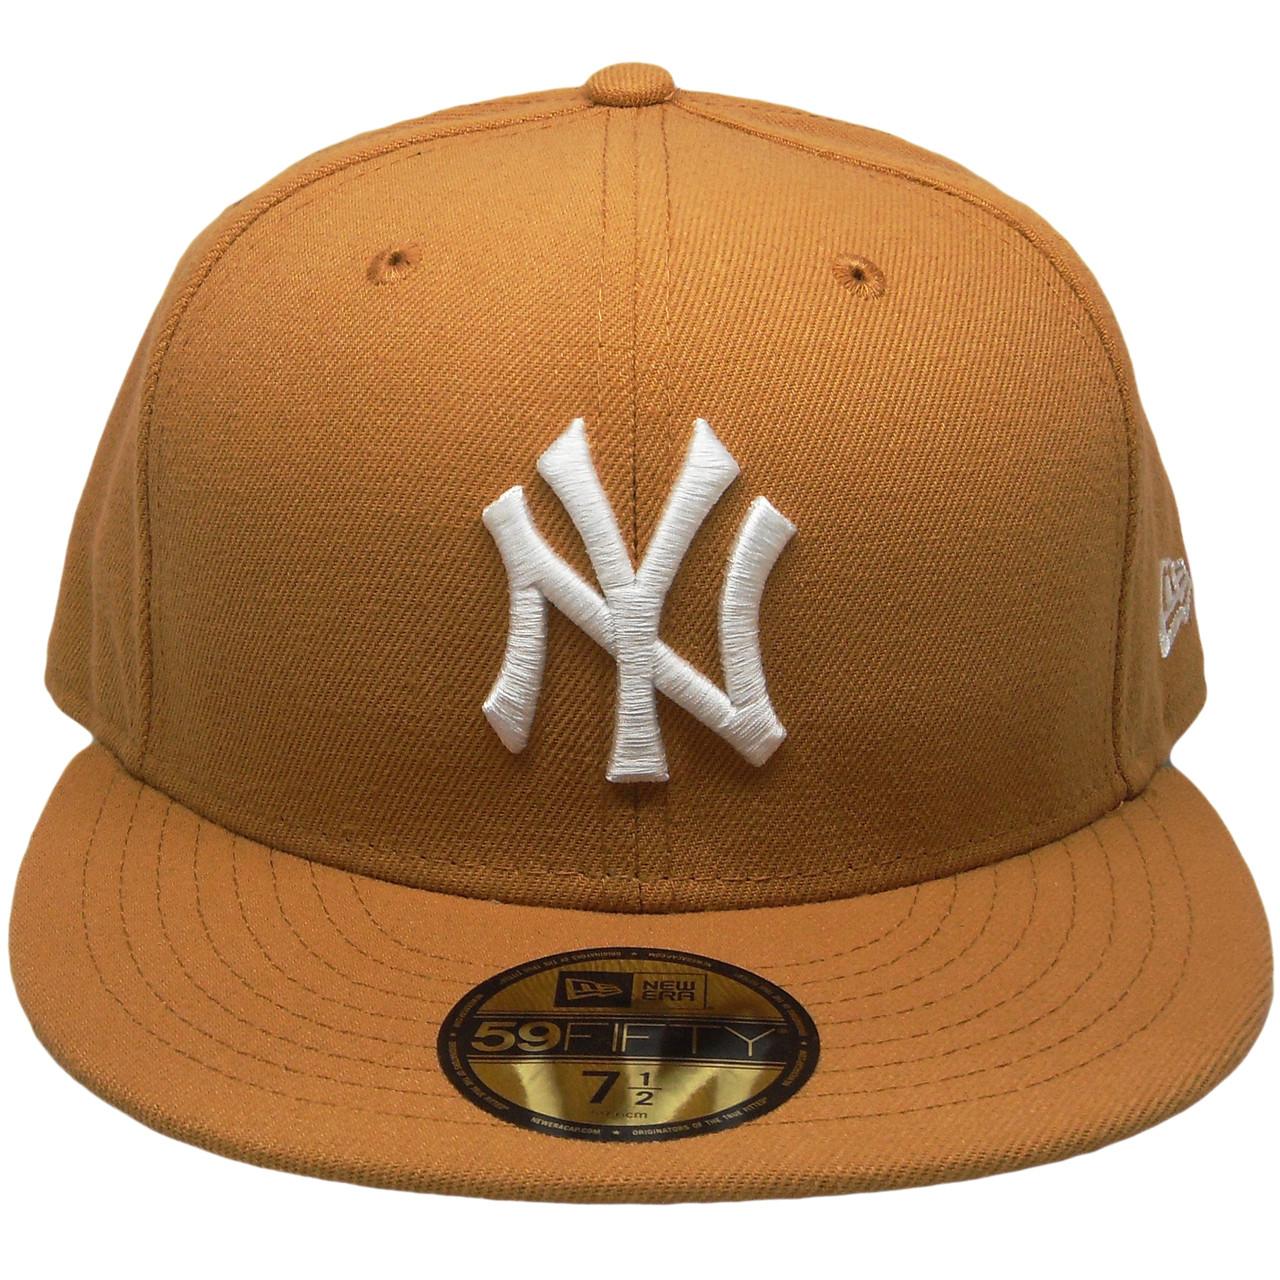 c1fdb9b33ce New York Yankees New Era Custom 59Fifty Fitted Hat - Wheat